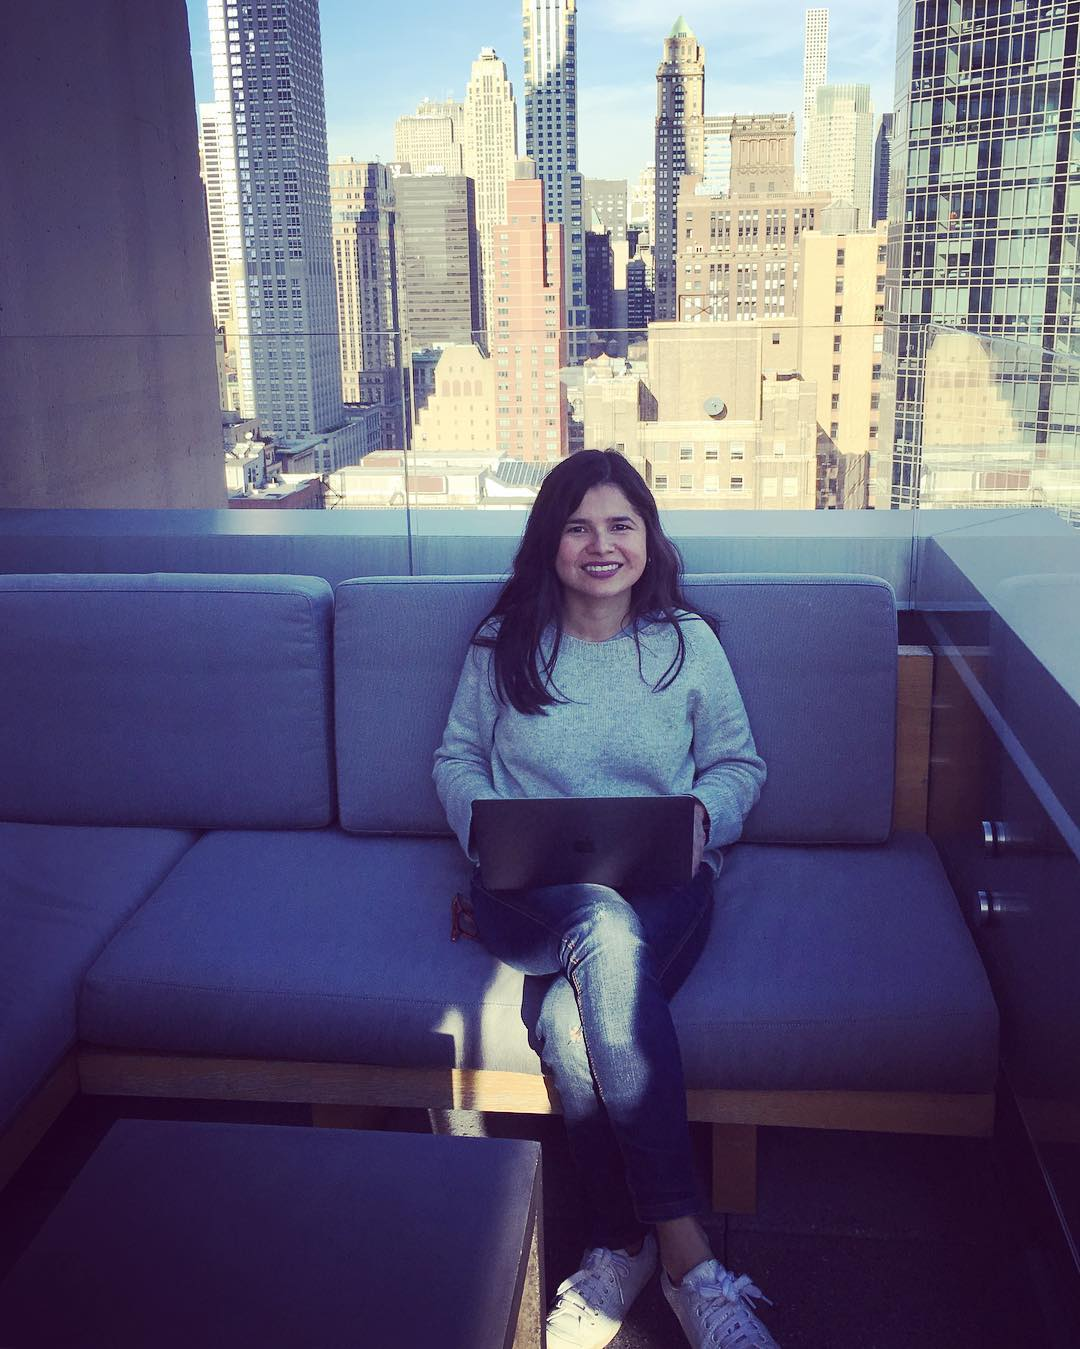 SEO Expert Aleyda Solis Talks Remote Work, Flexibility and Travel